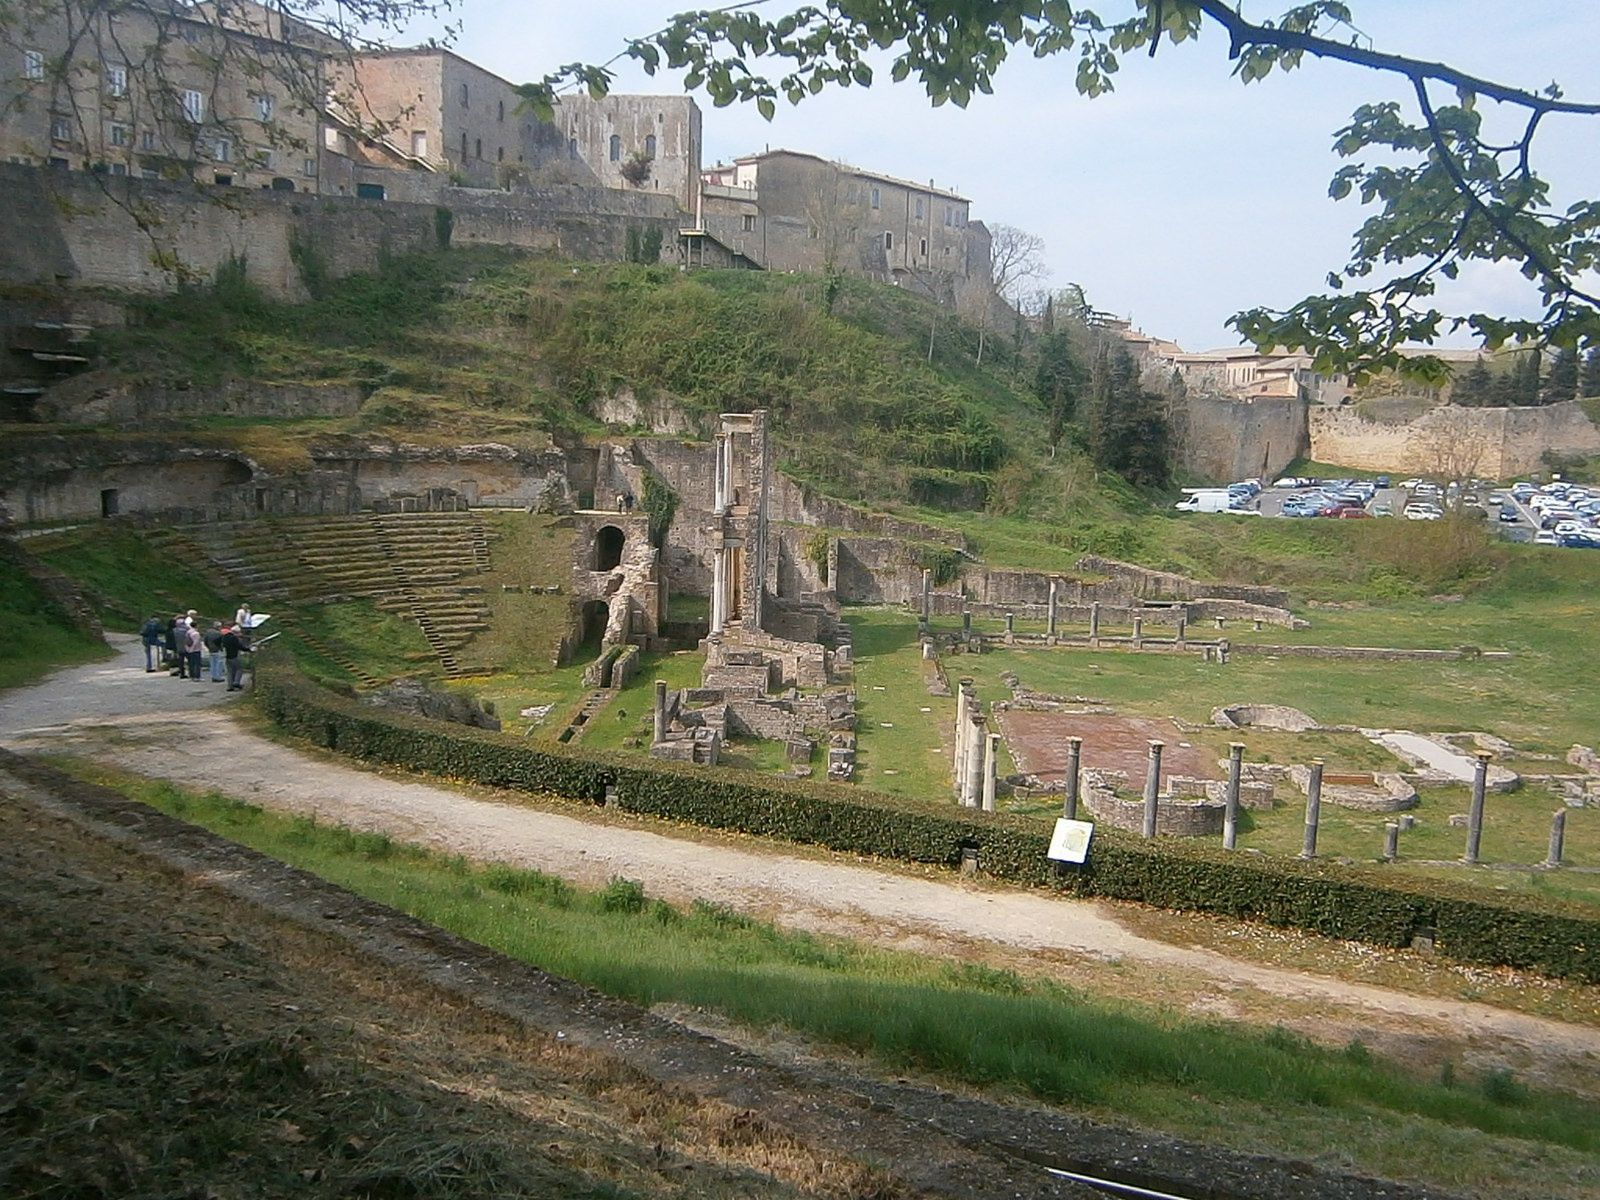 ( Le teatro romano de Volterra )